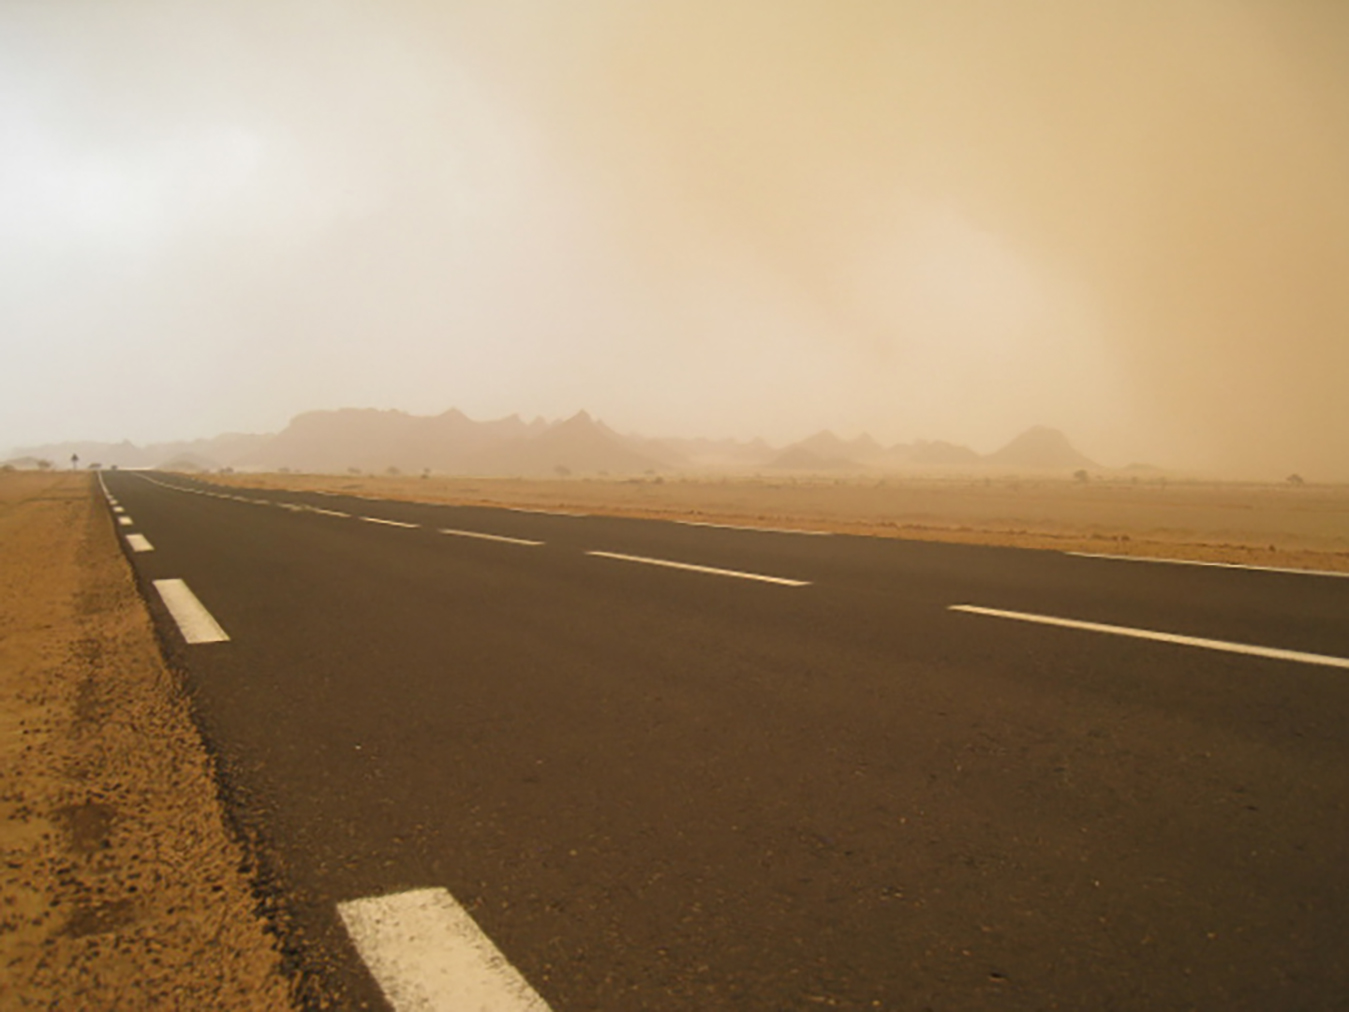 Cesta cez Saharu